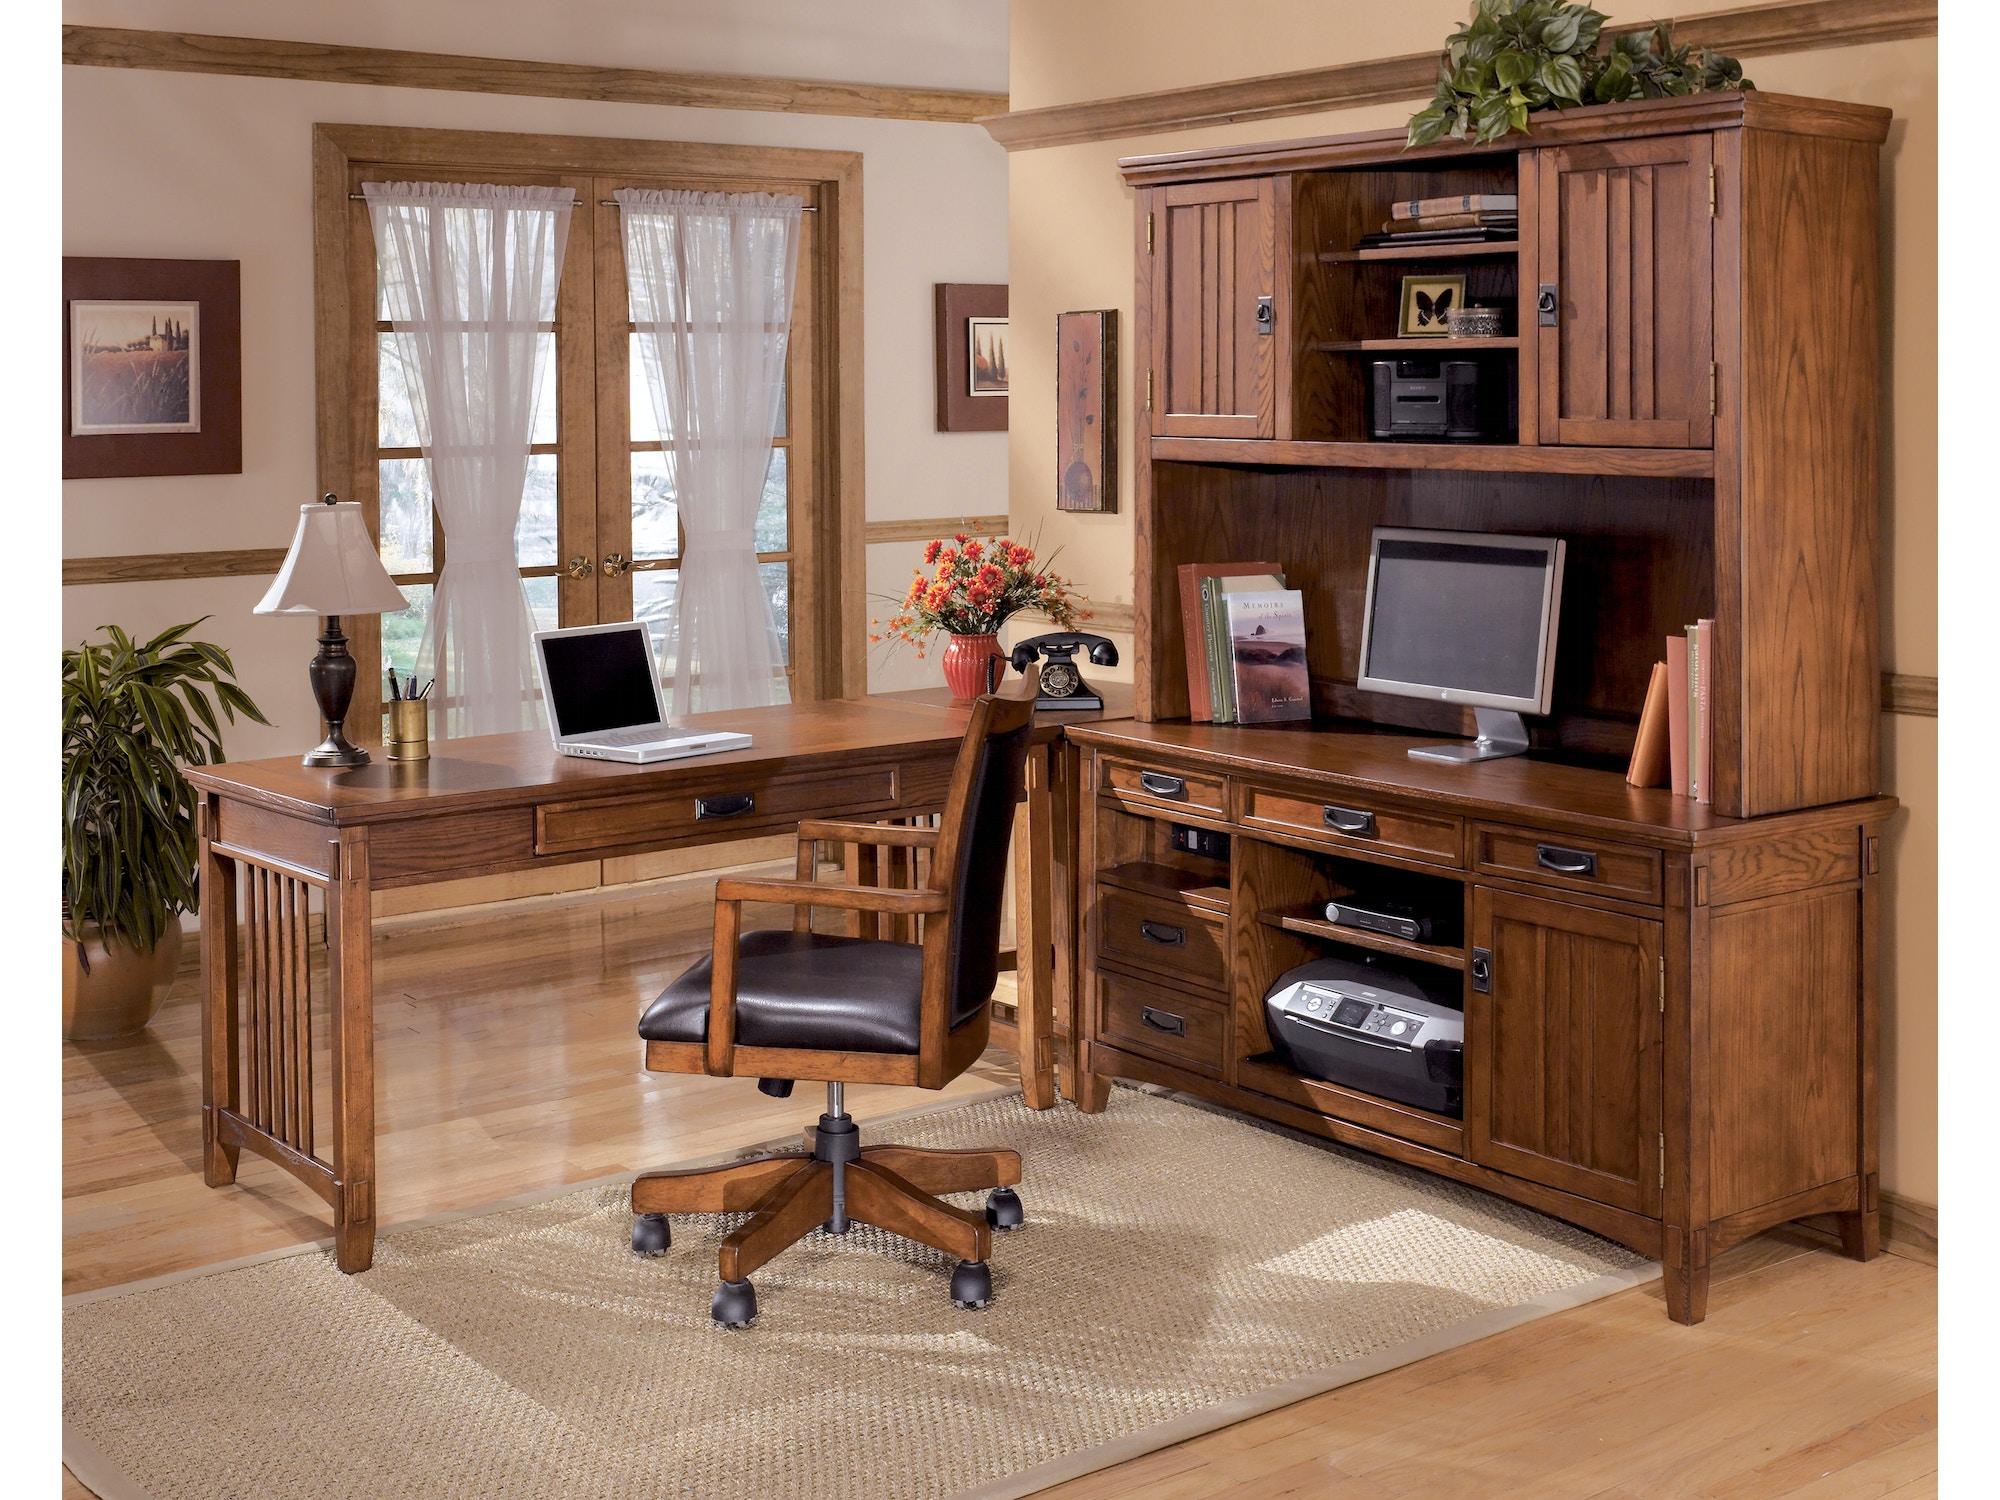 Home Office Furniture Cincinnati morris home furnishings oregon district oregon district sawhorse desk 448759 Cross Island Home Office